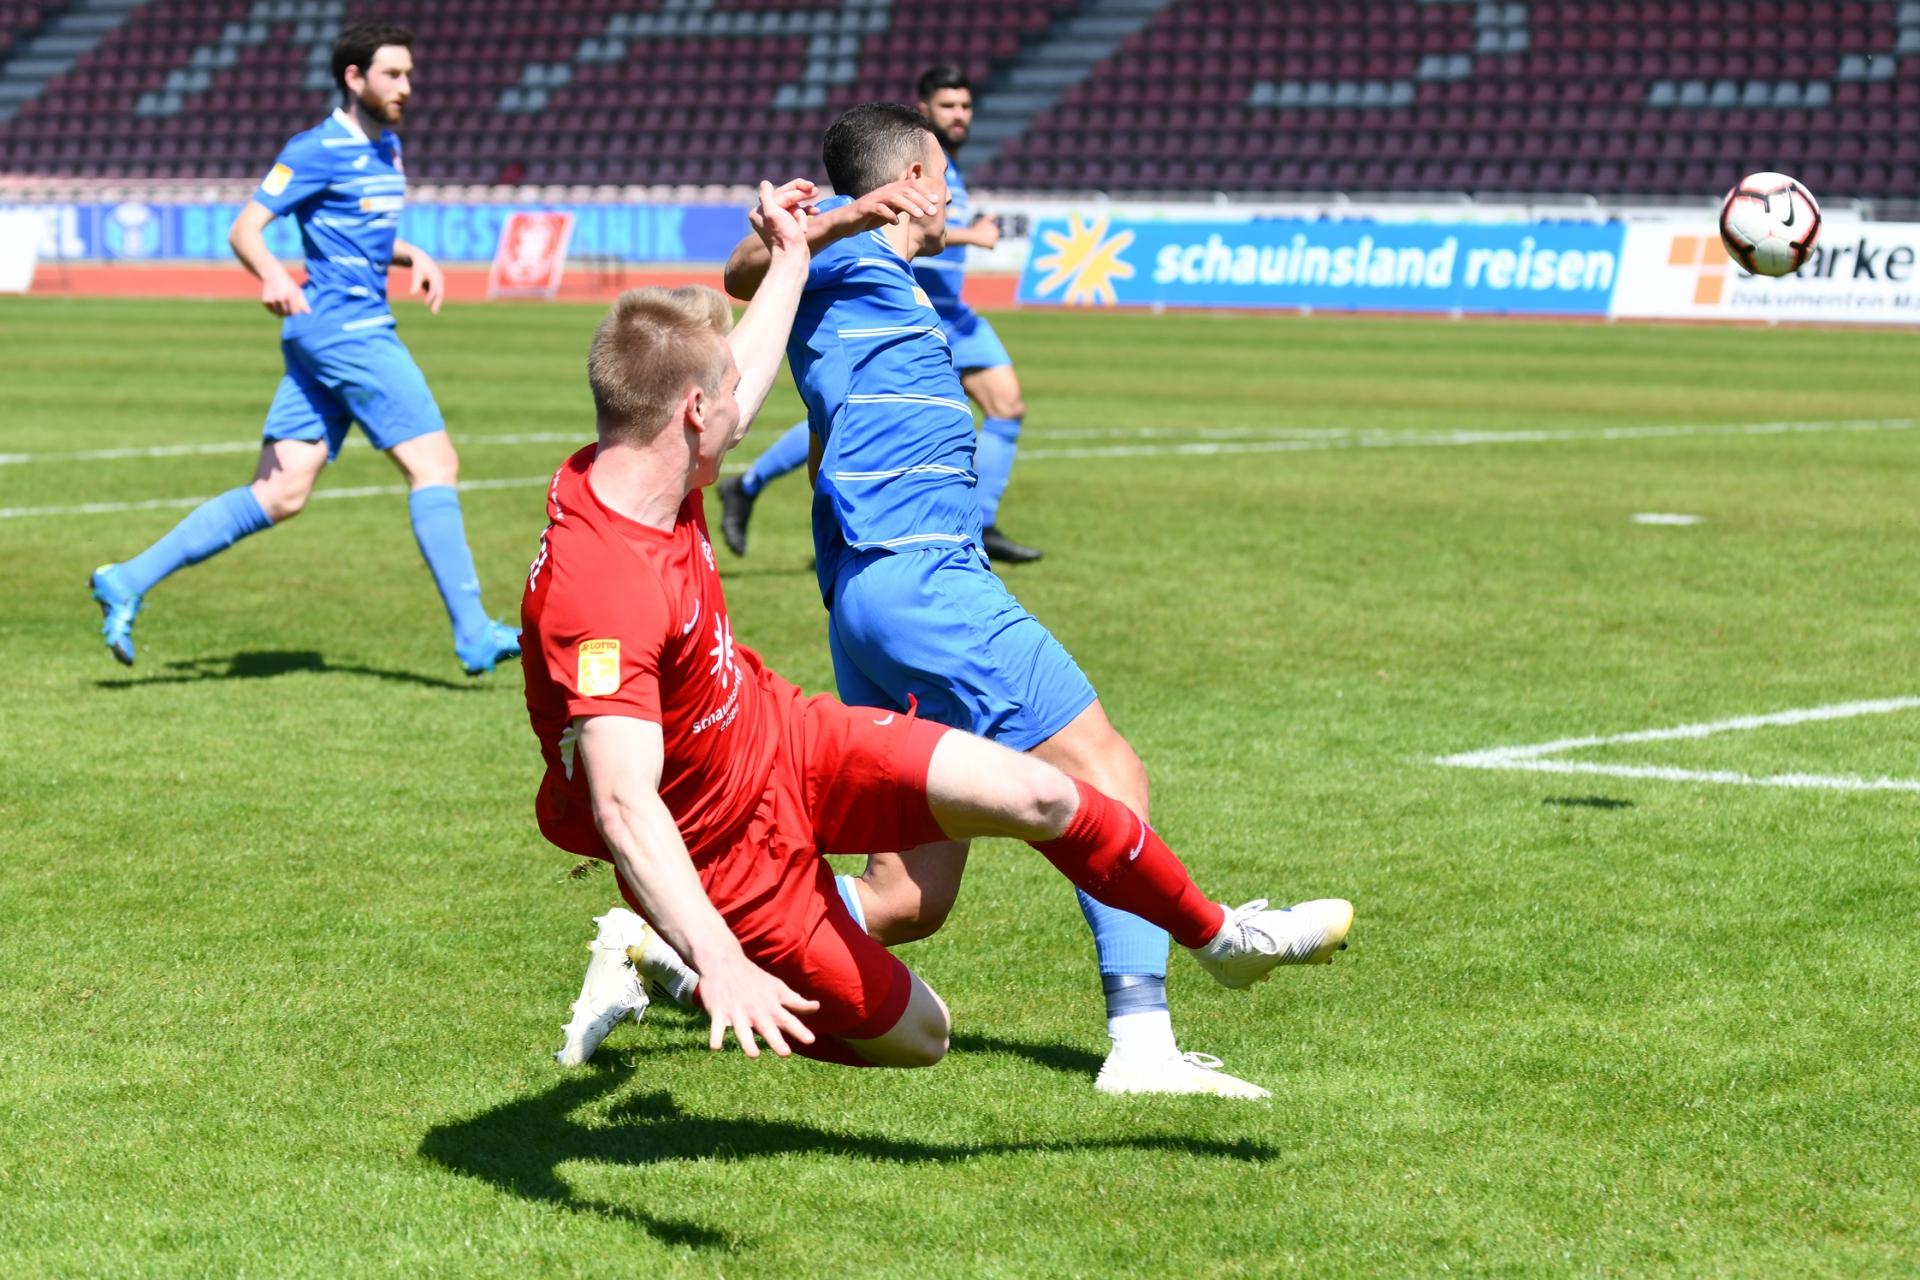 Lotto Hessenliga 2018/2019, KSV Hessen Kassel, T�rk G�c� Friedberg, Endstand 4:0, Brian Schwechel (KSV Hessen Kassel)